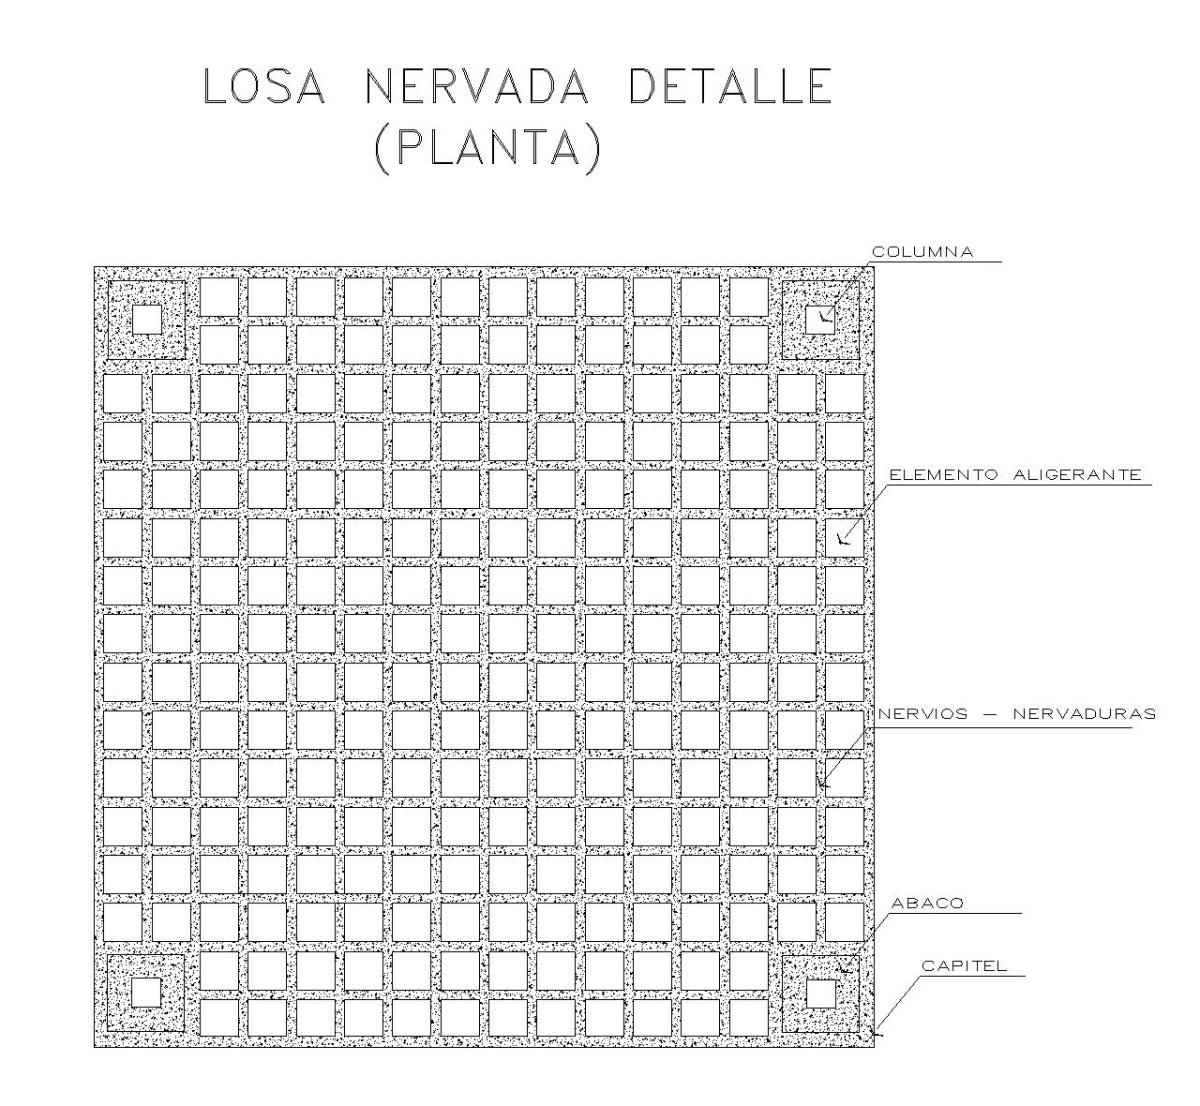 PLANTA LOSA NERVADA